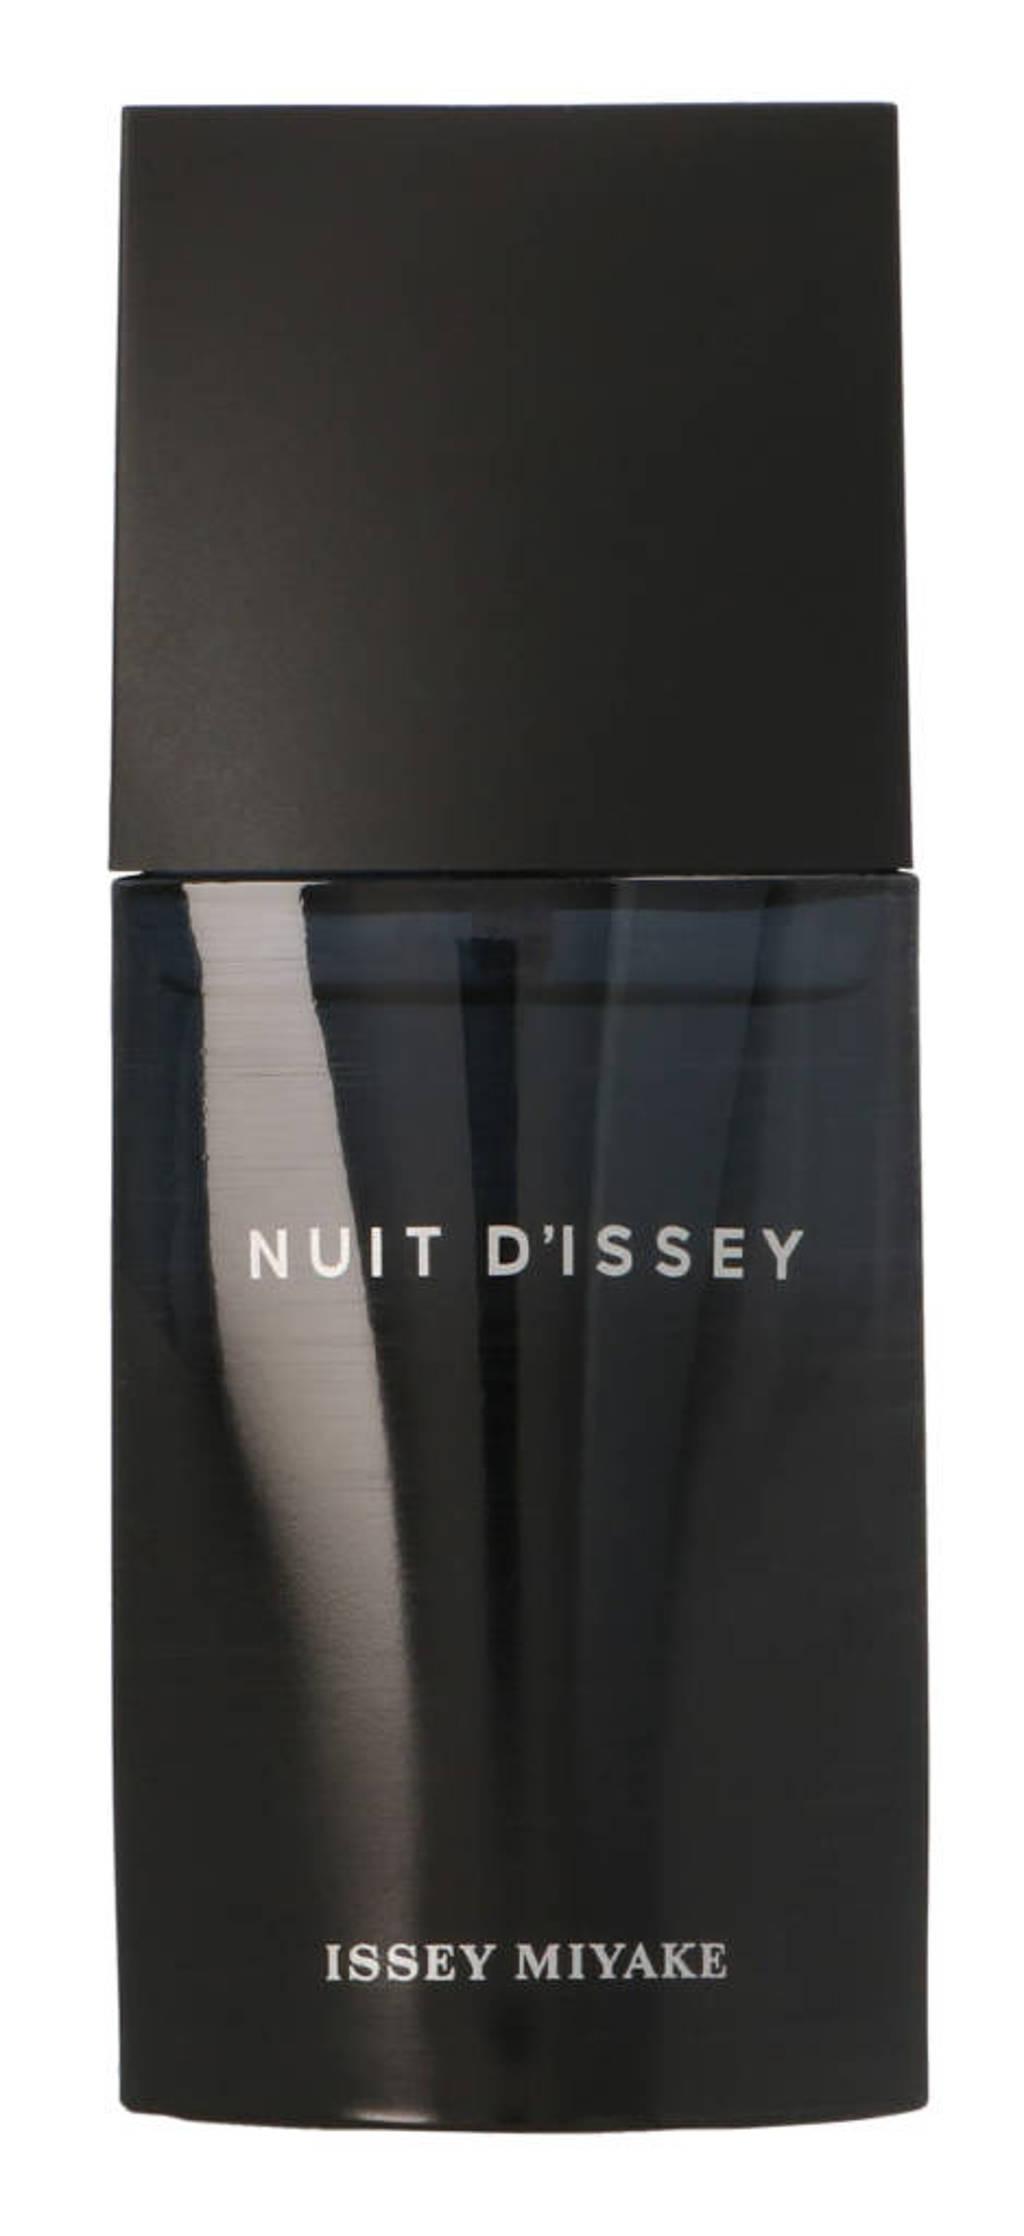 Issey Miyake Nuit D'Issey eau de toilette - 40 ml